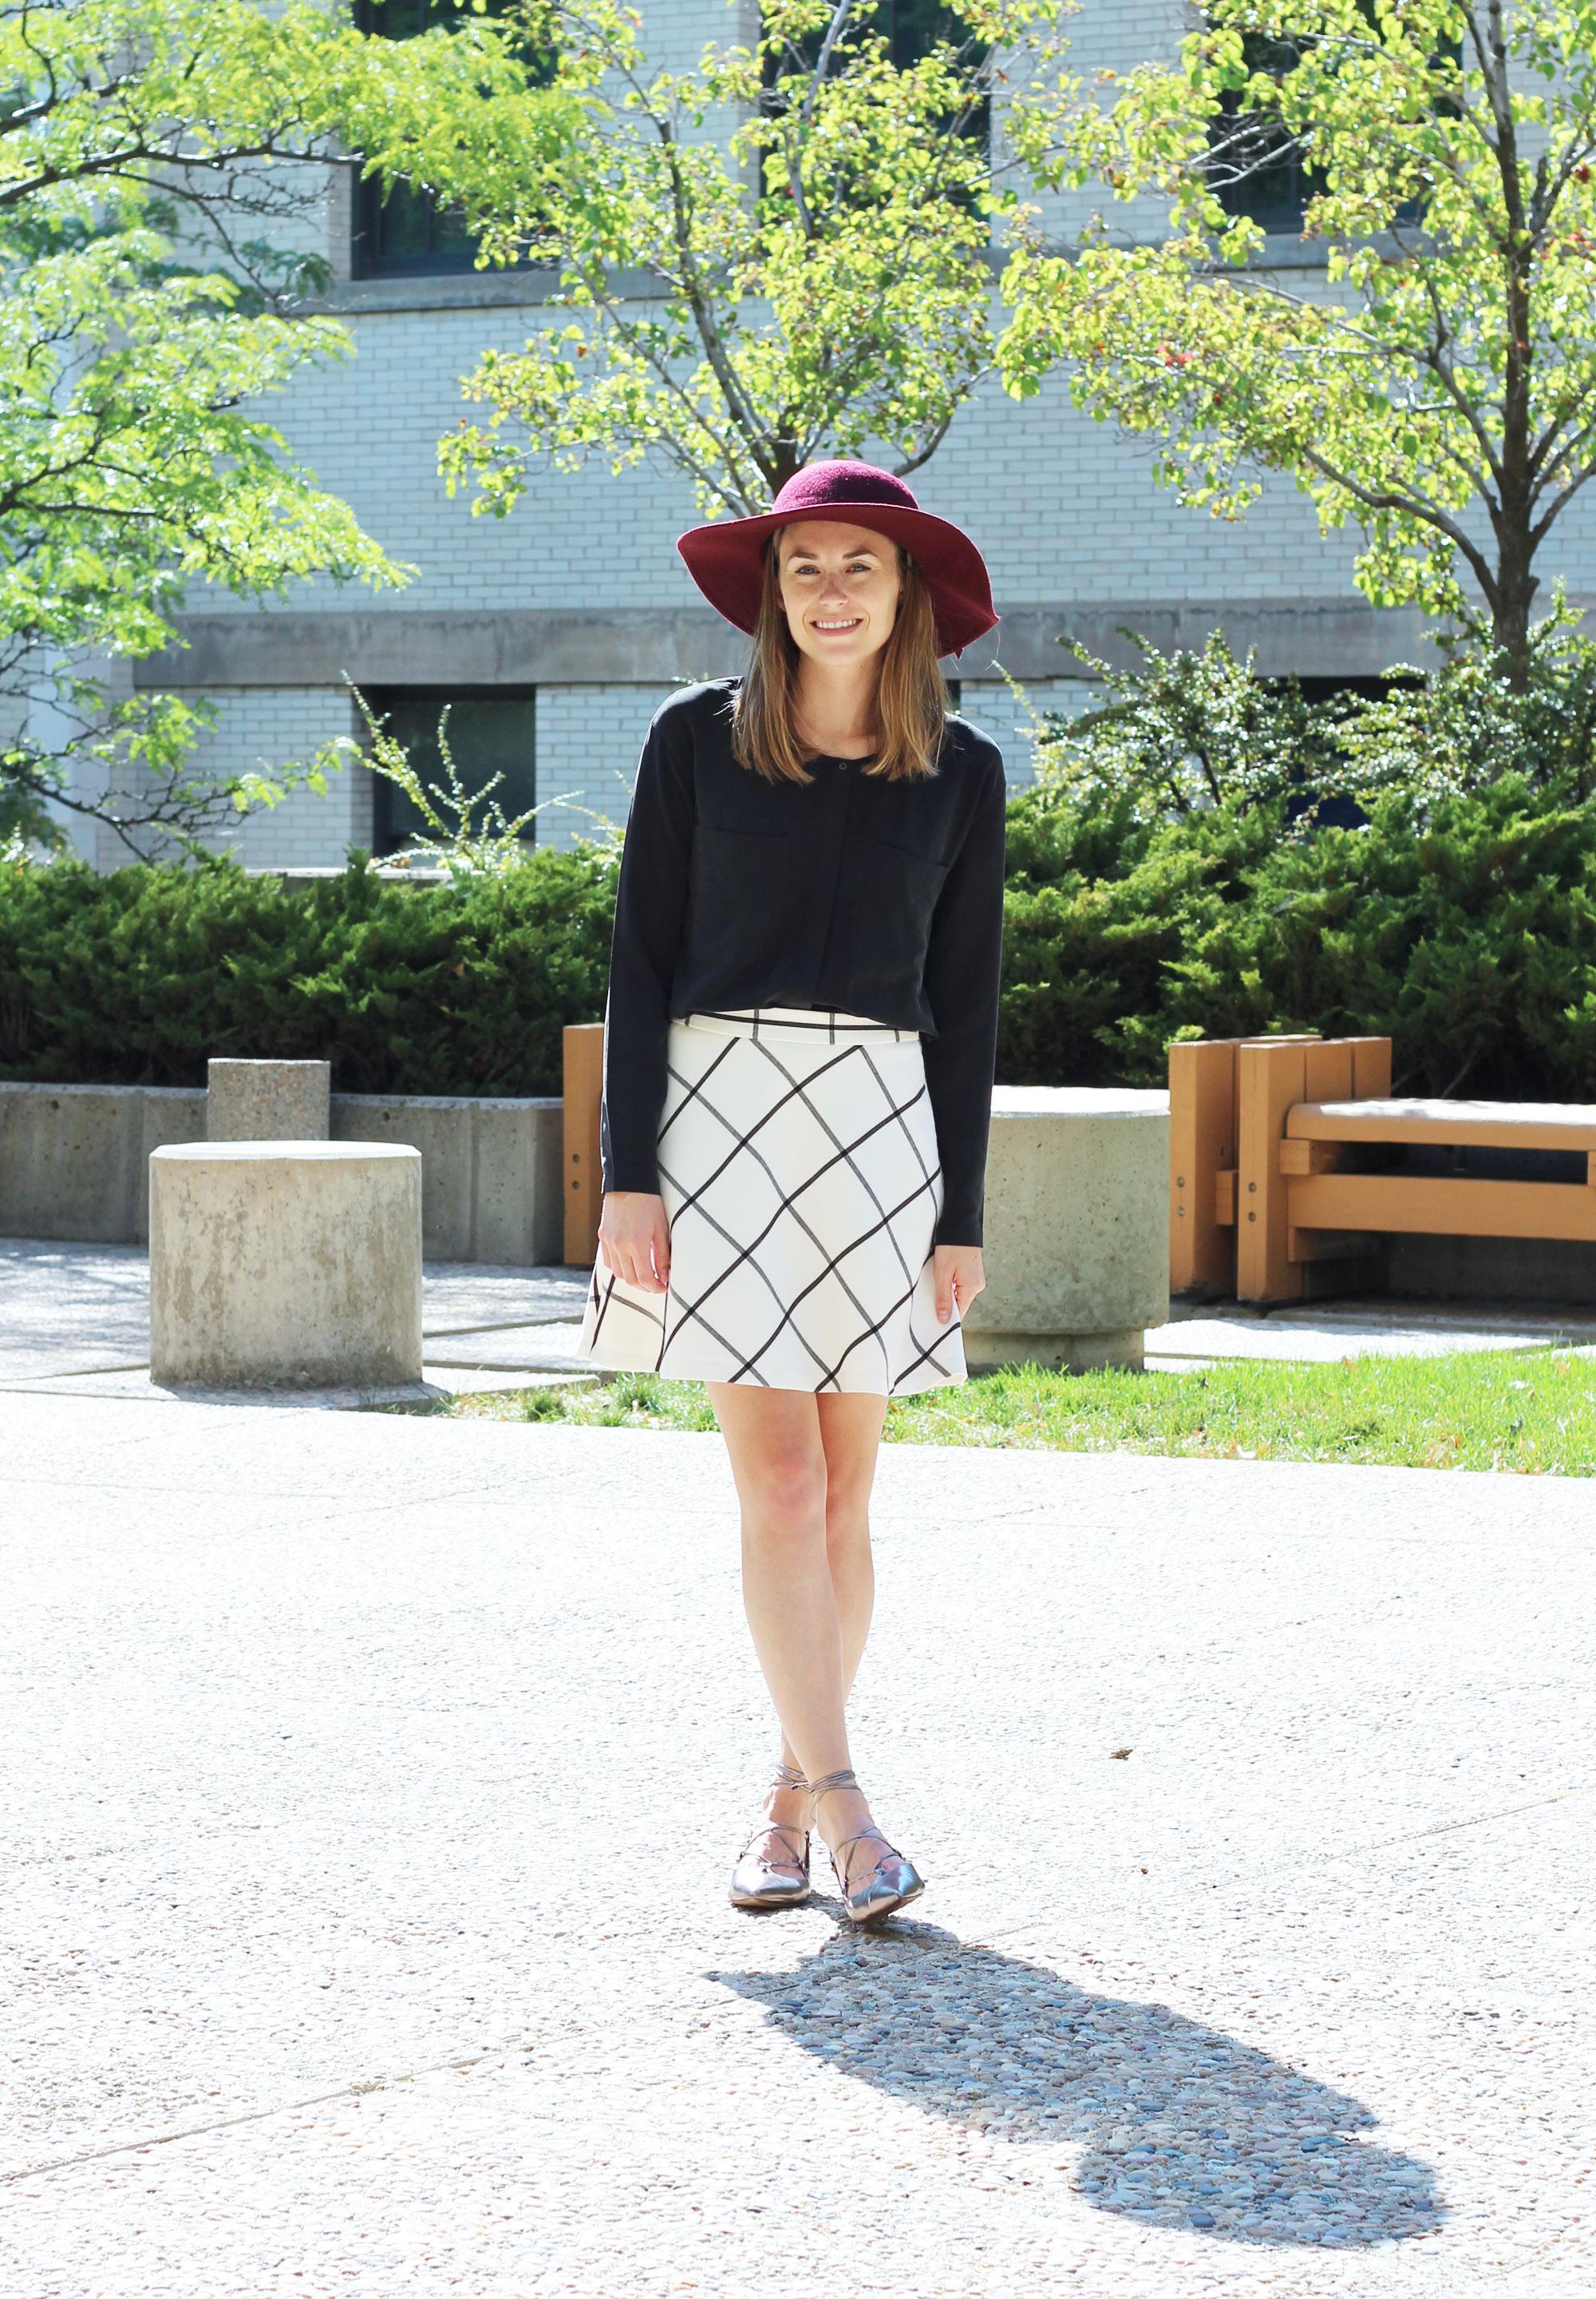 Fall outfit: Burgundy floppy hat, black silk shirt, windowpane skirt, lace-up flats — Cotton Cashmere Cat Hair